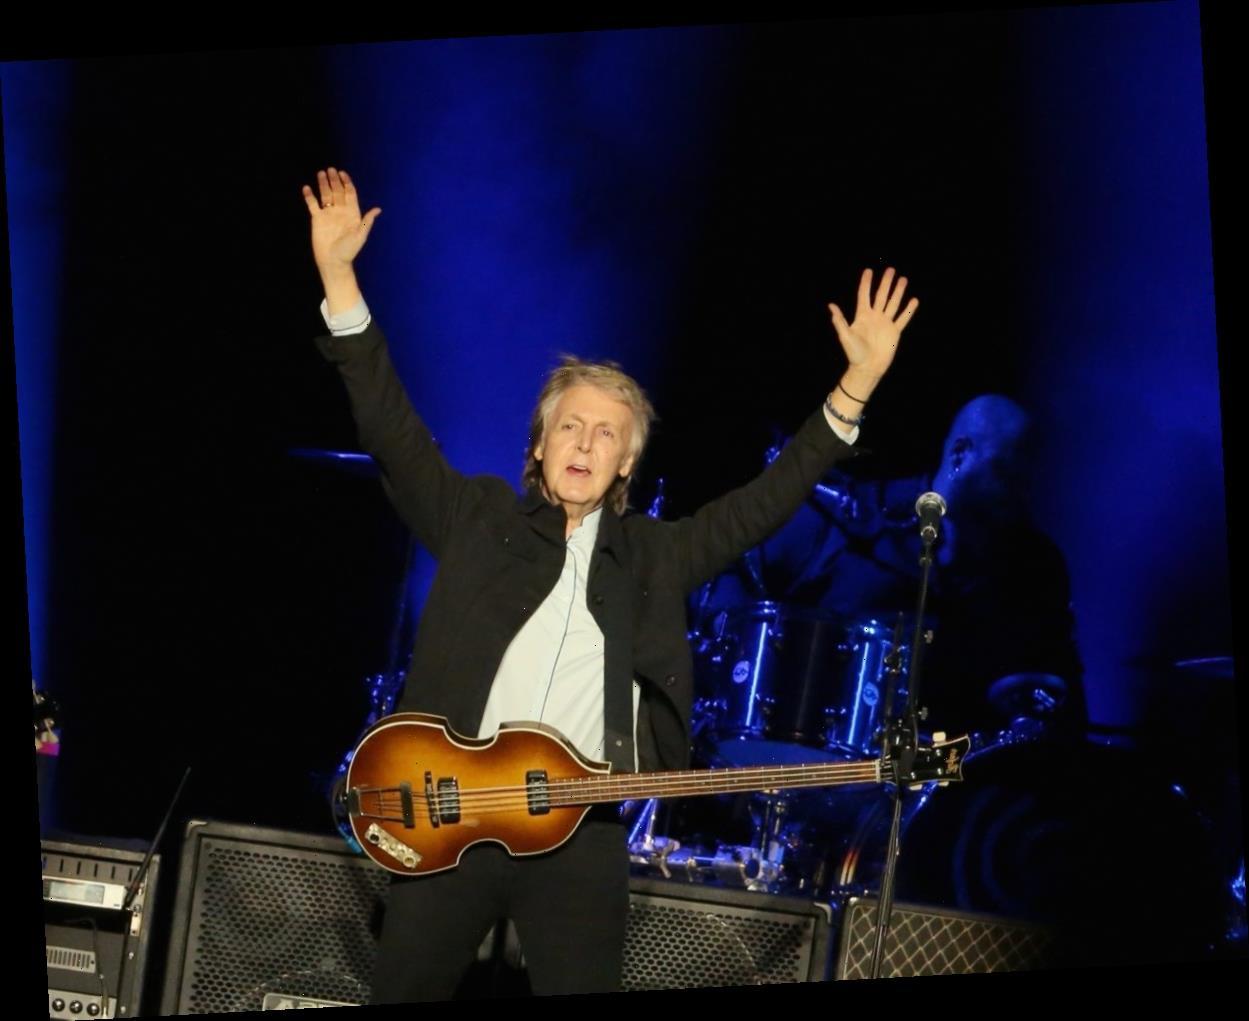 Paul McCartney Explains Why He's Jealous of Bob Dylan